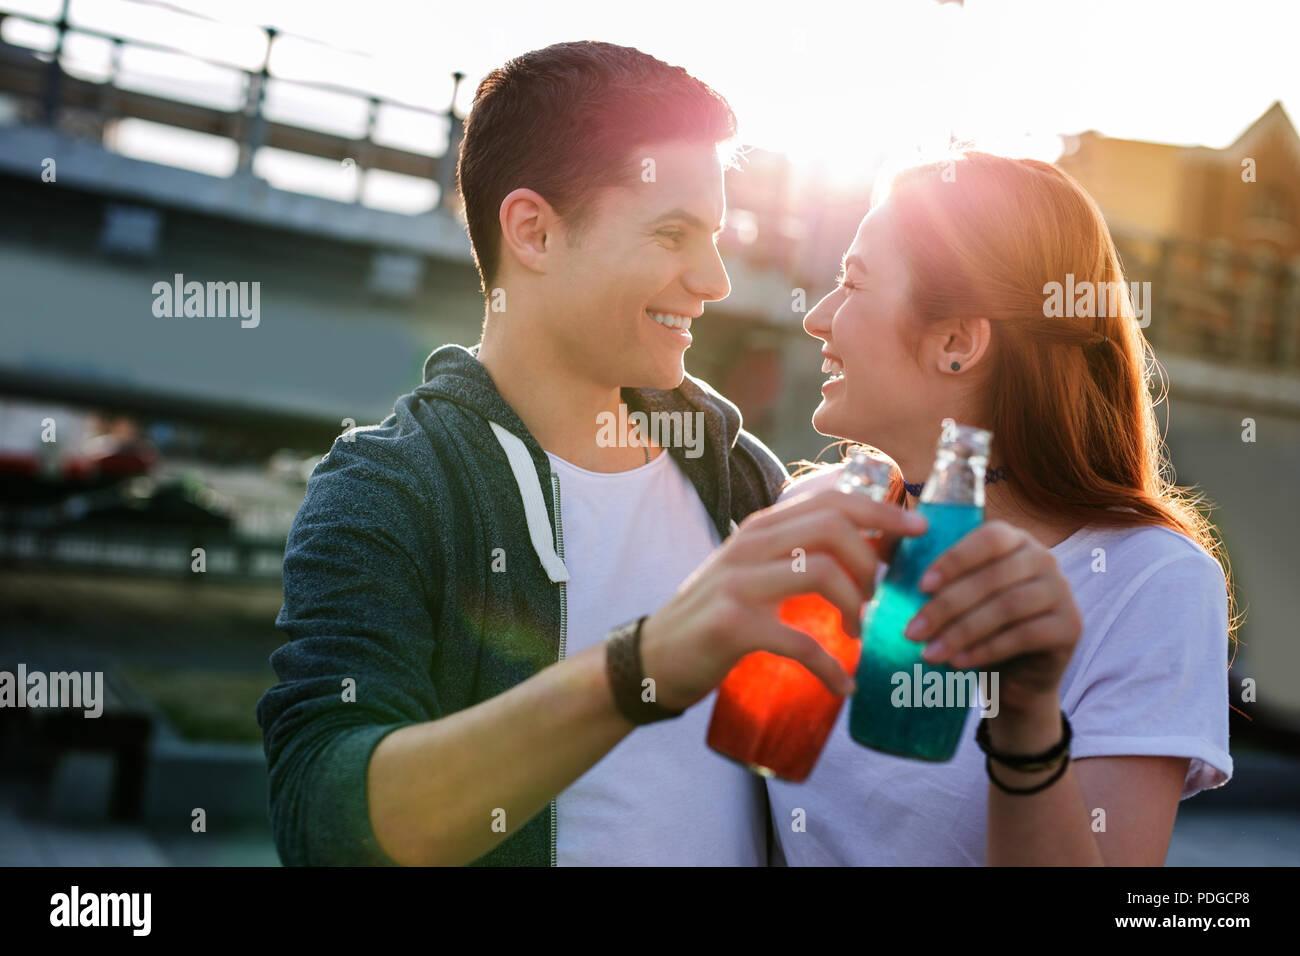 Nice happy couple cheering with drinks Sweet memories. - Stock Image